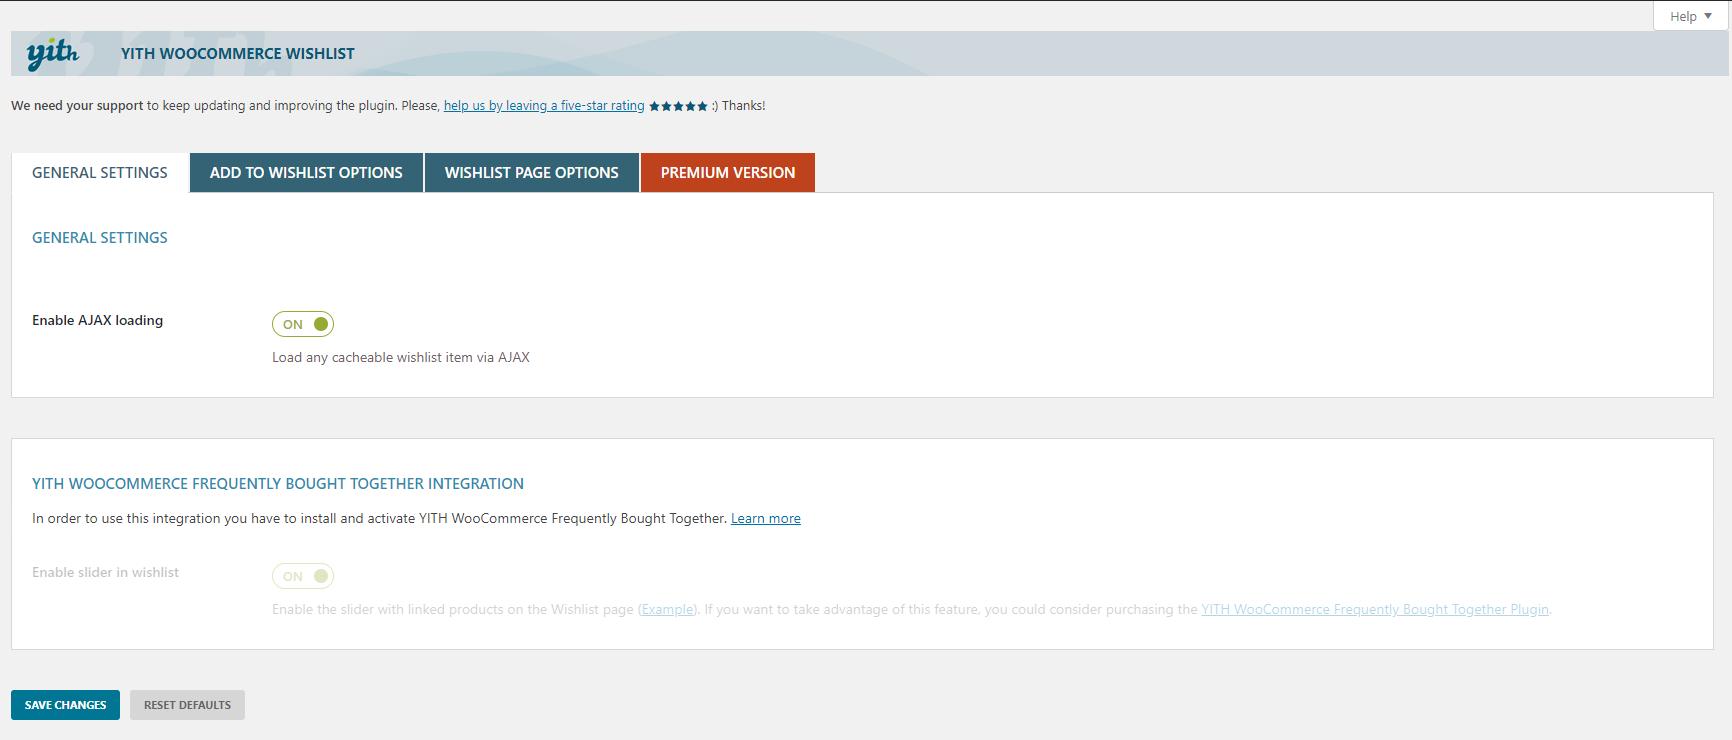 Wishlist settings page (1/3)